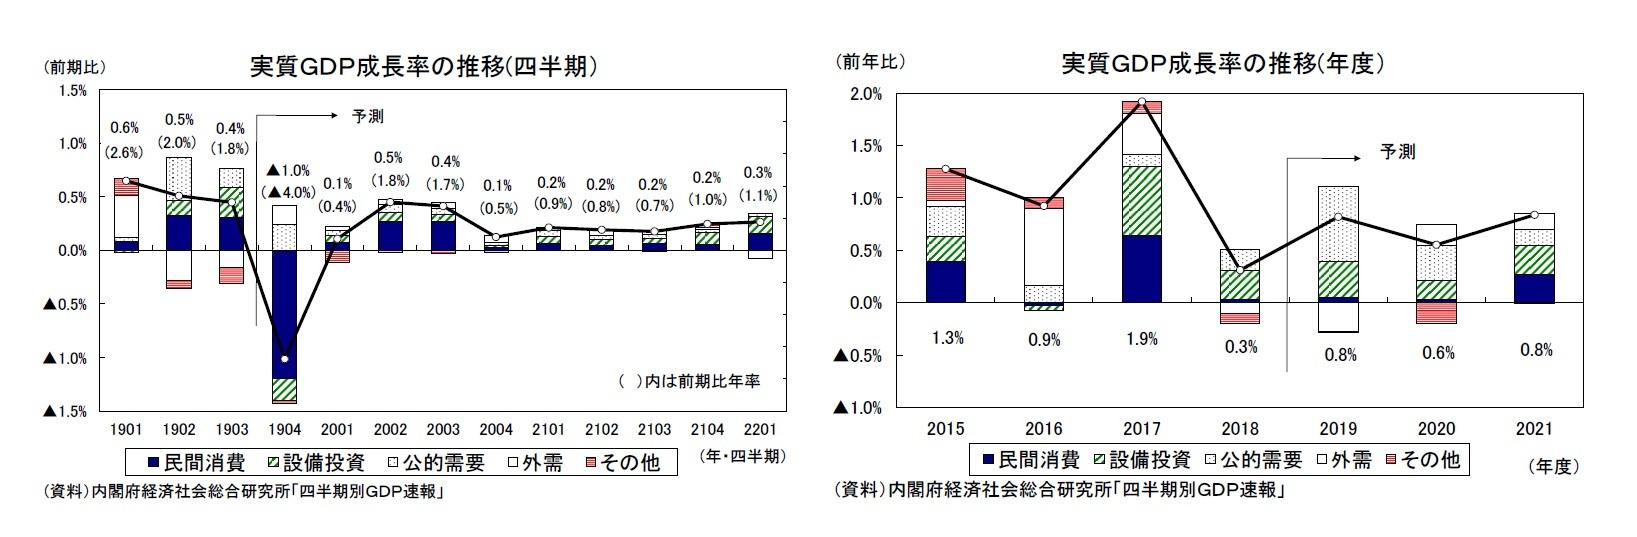 実質GDP成長率の推移(四半期)/実質GDP成長率の推移(年度)